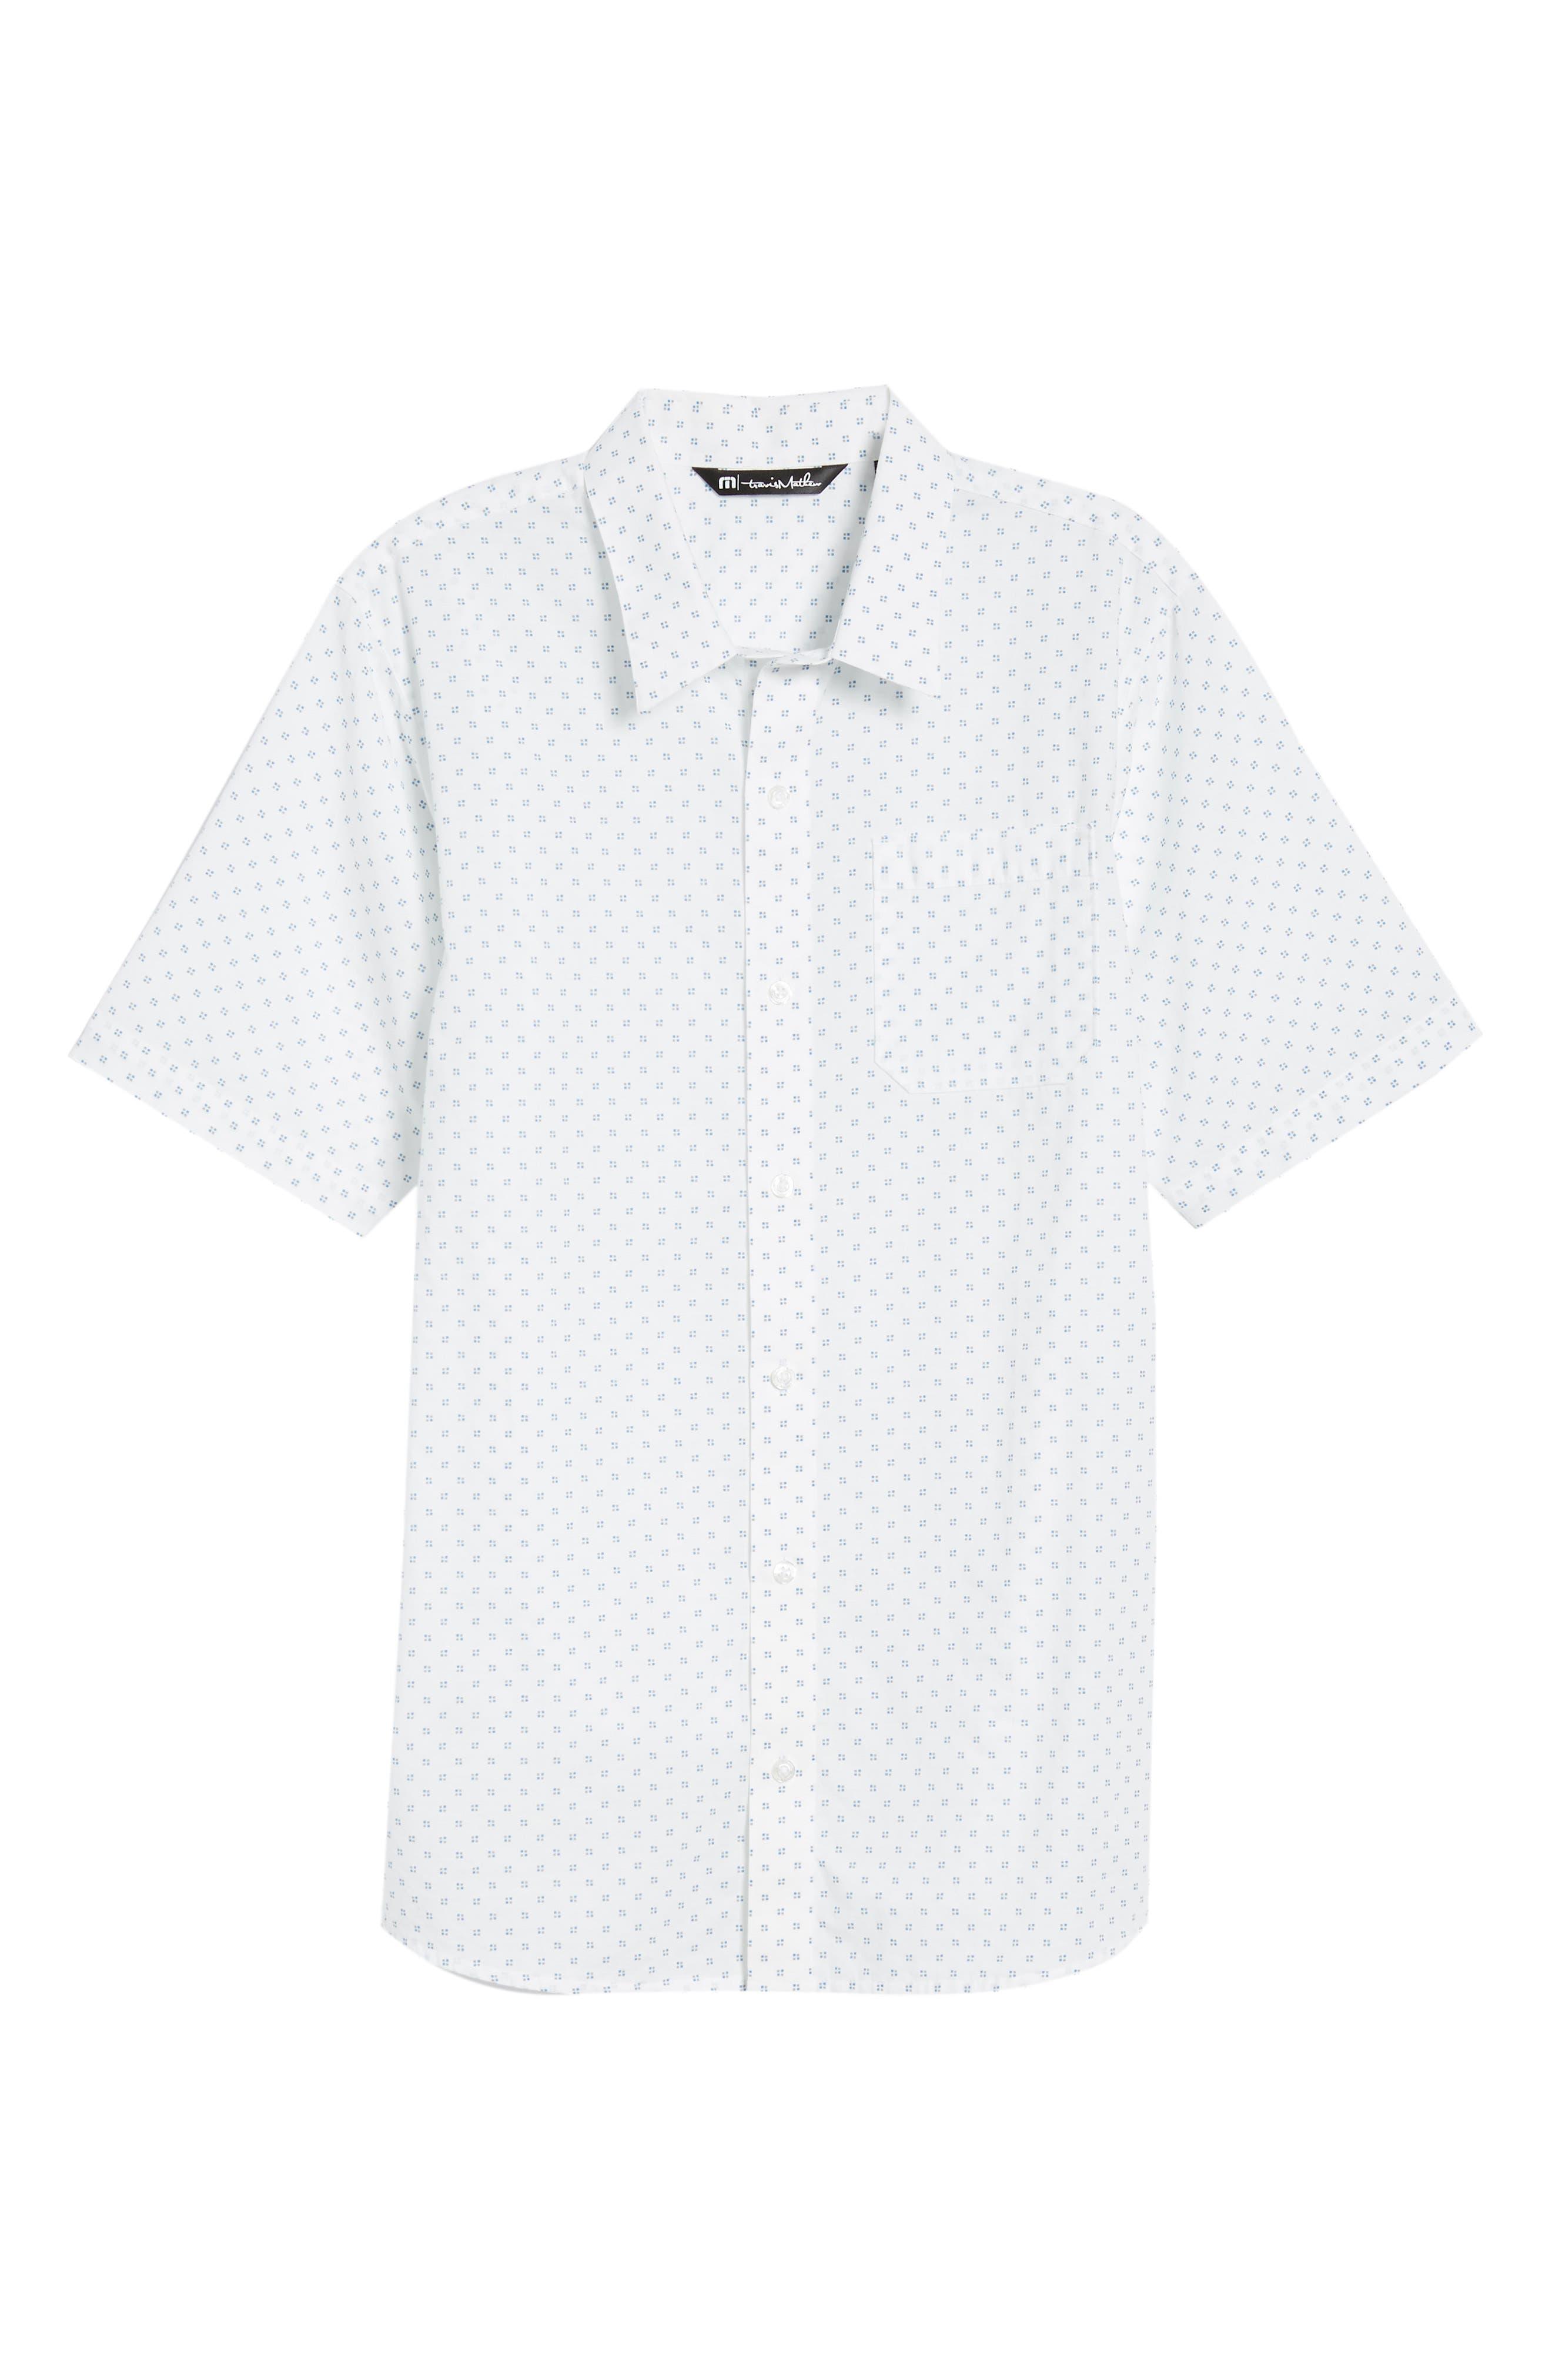 Nangs Print Sport Shirt,                             Alternate thumbnail 6, color,                             White